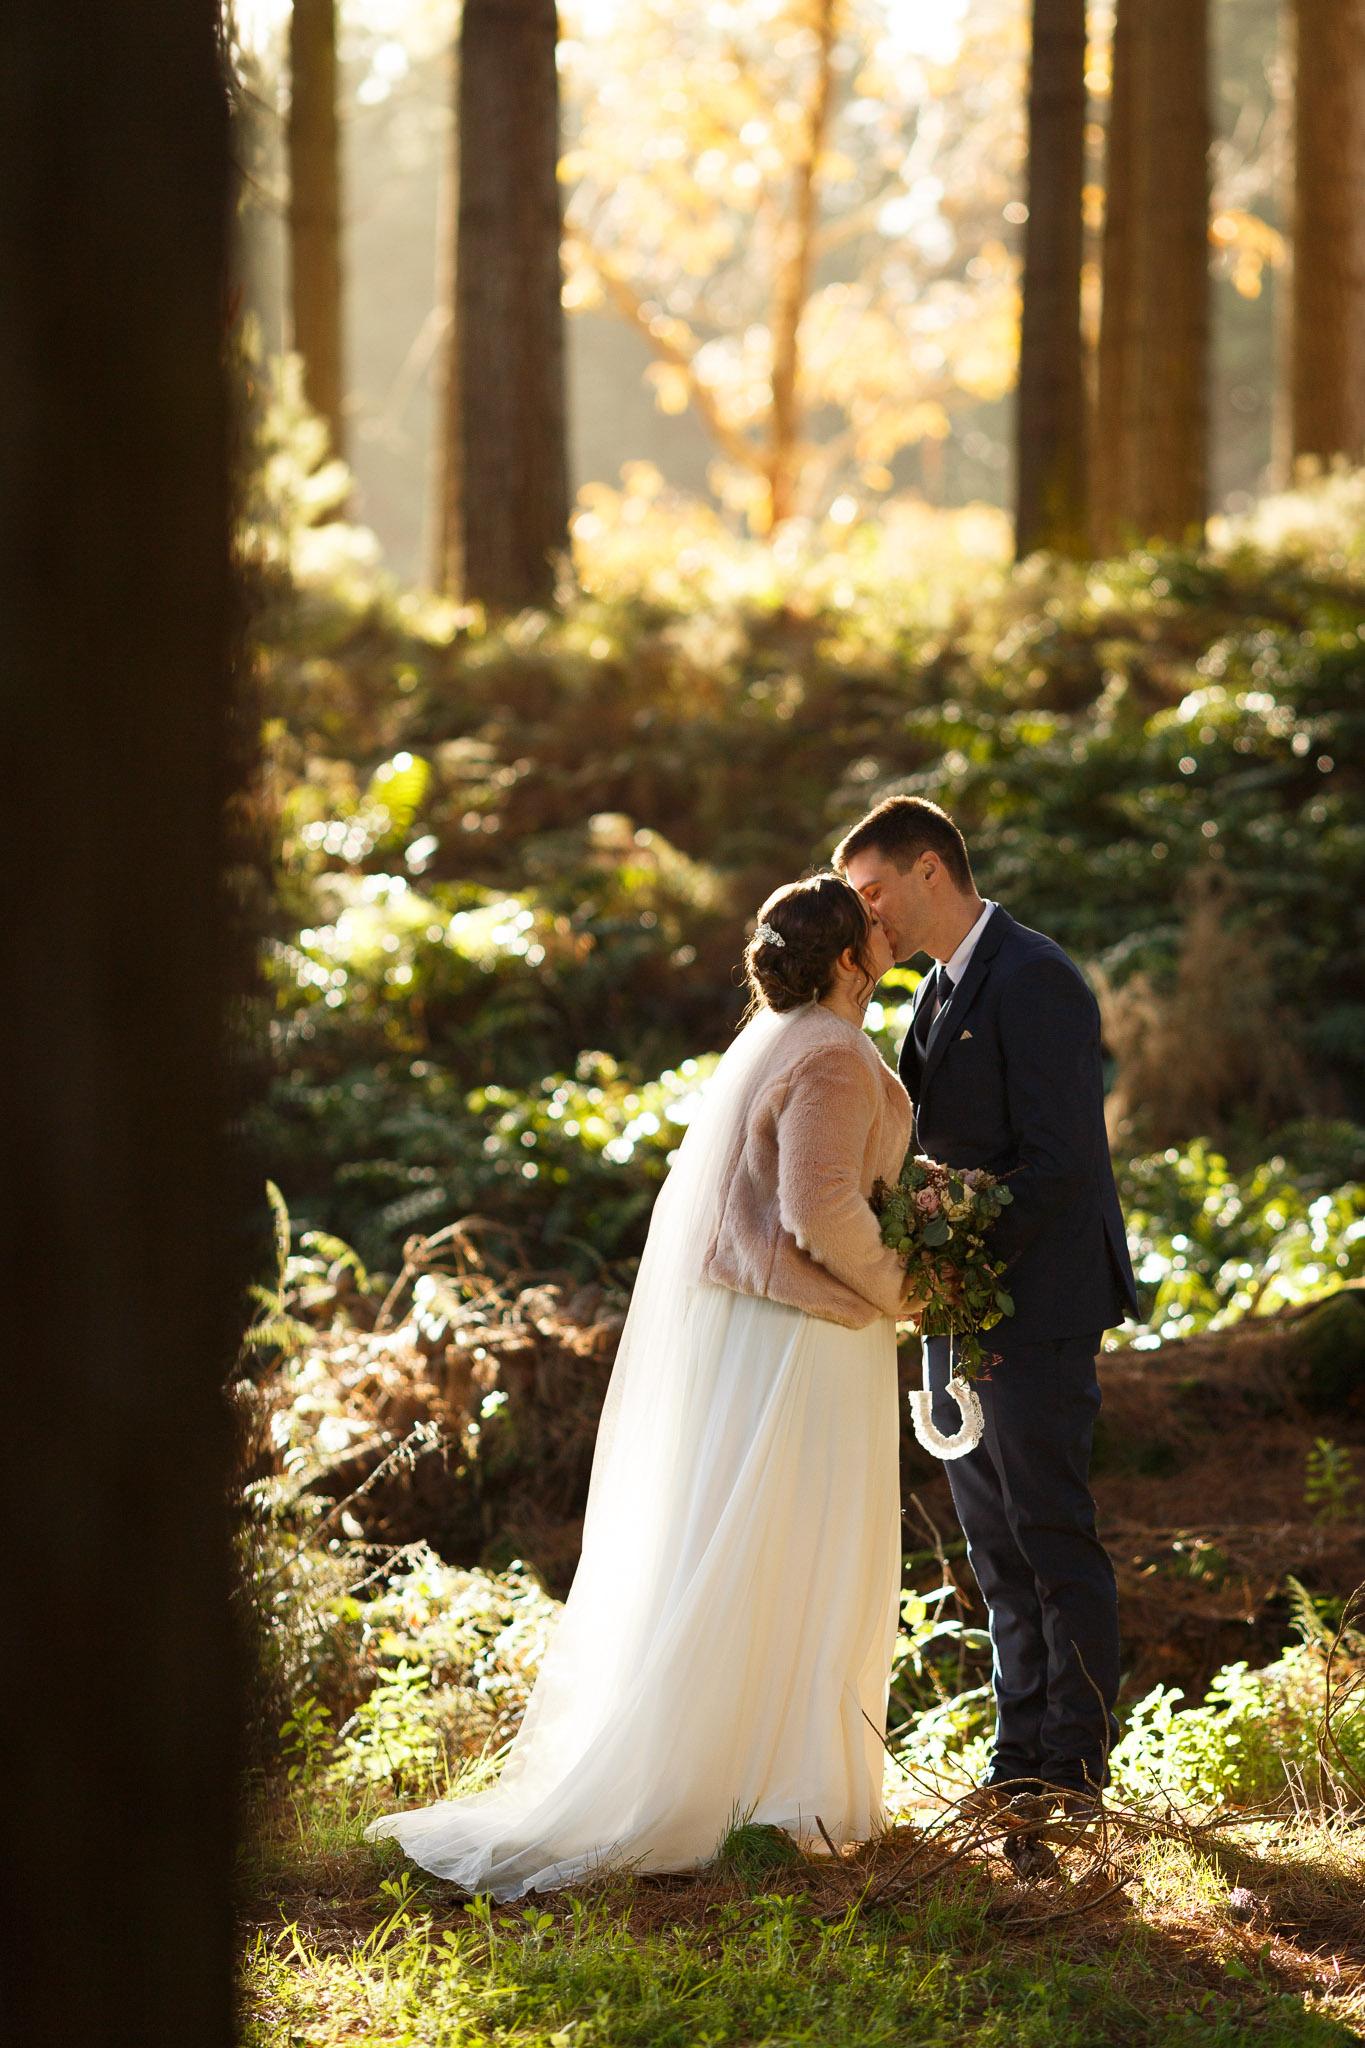 highlight_wedding_photography_manawatu_palmerston_north_new_zealand_rangitikei_golf_ohakea-48.jpg